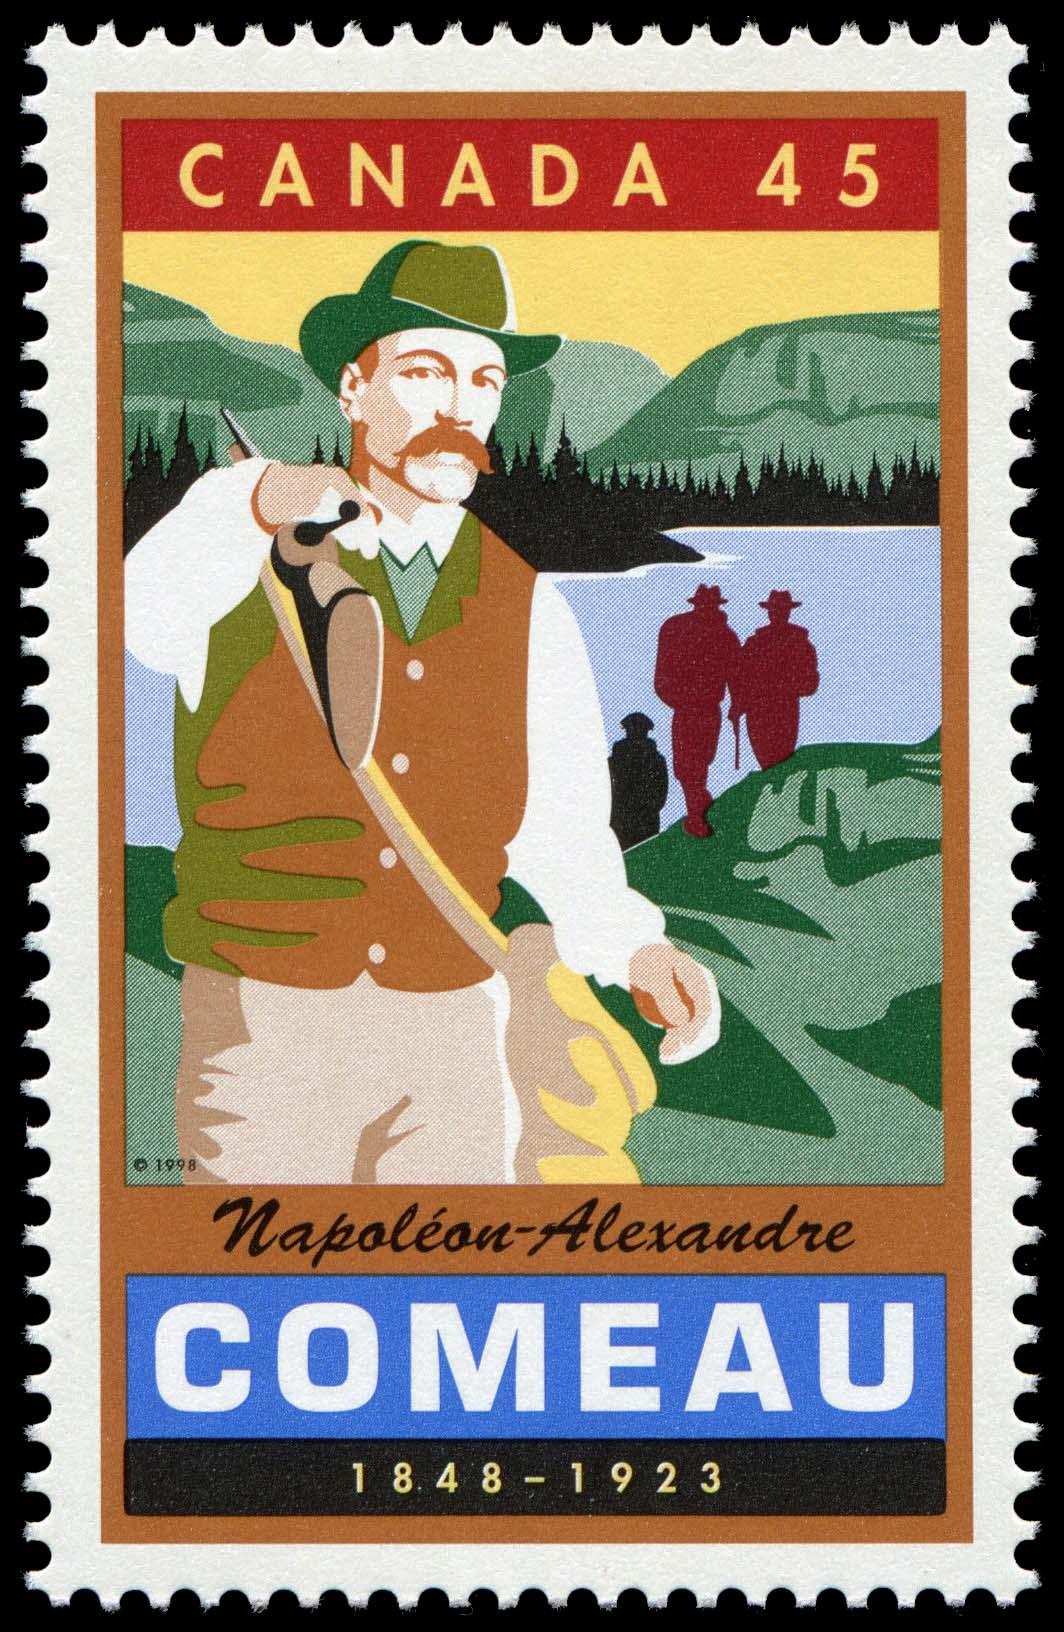 Napoleon-Alexandre Comeau, 1848-1923 Canada Postage Stamp | Legendary Canadians